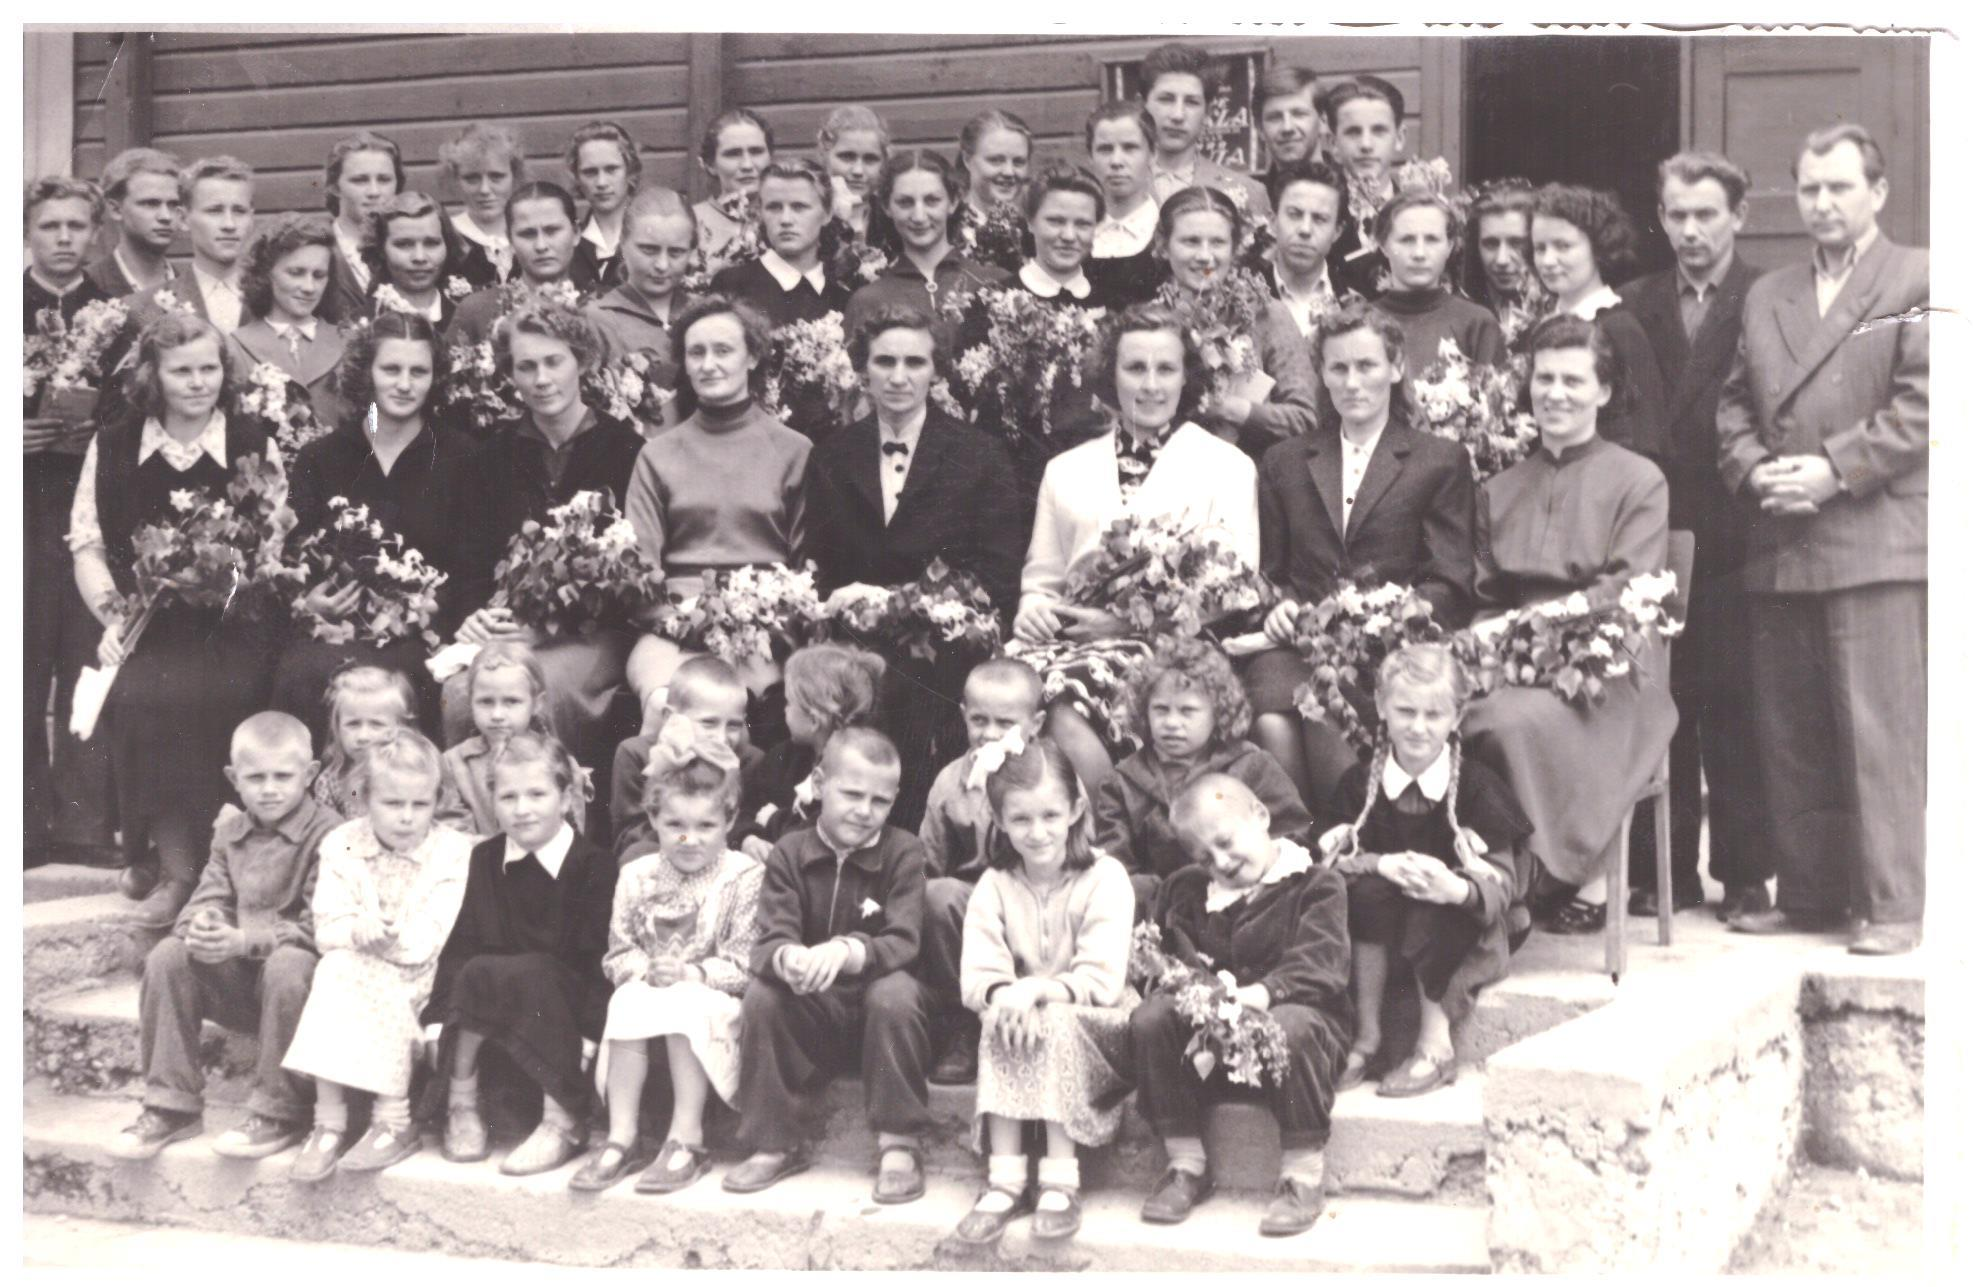 Bazilionų abit.1960 laida po pask. skamb. V. Bagdonavičius stovi ketvirtas iš deš. | mokslolietuva.lt nuotr.